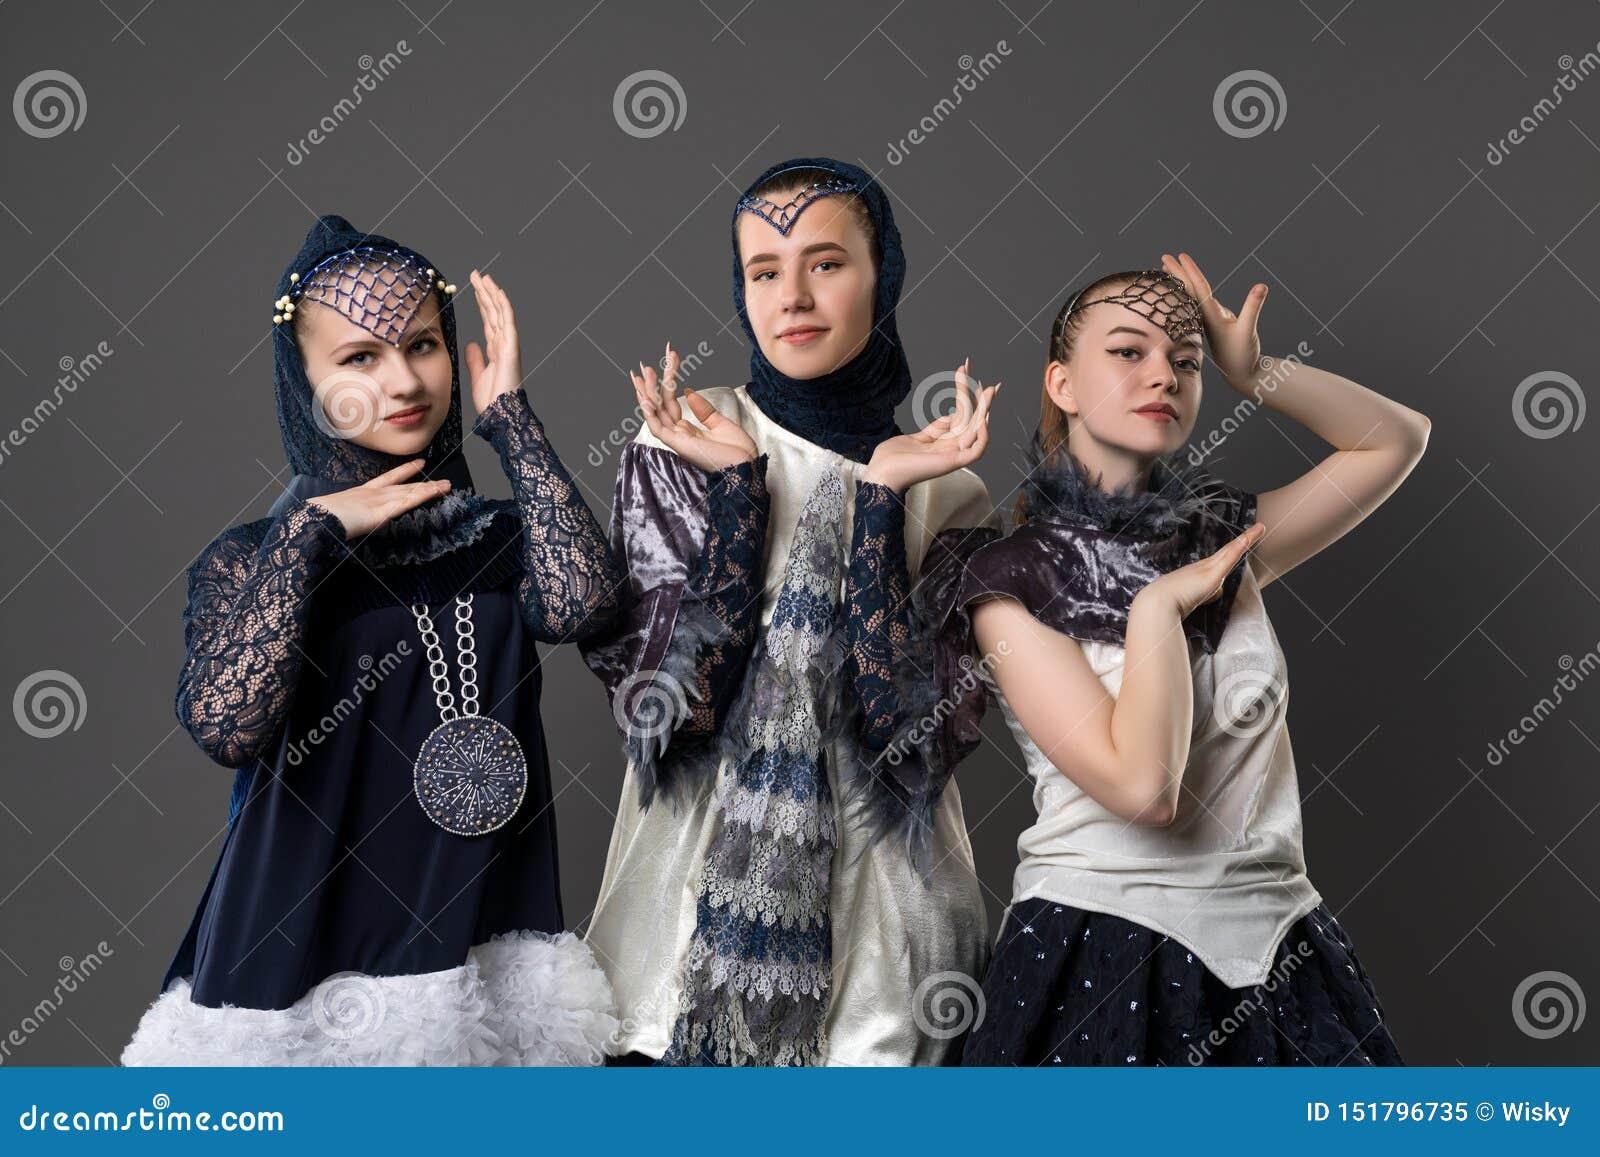 Shot of pretty teenagers in design dresses